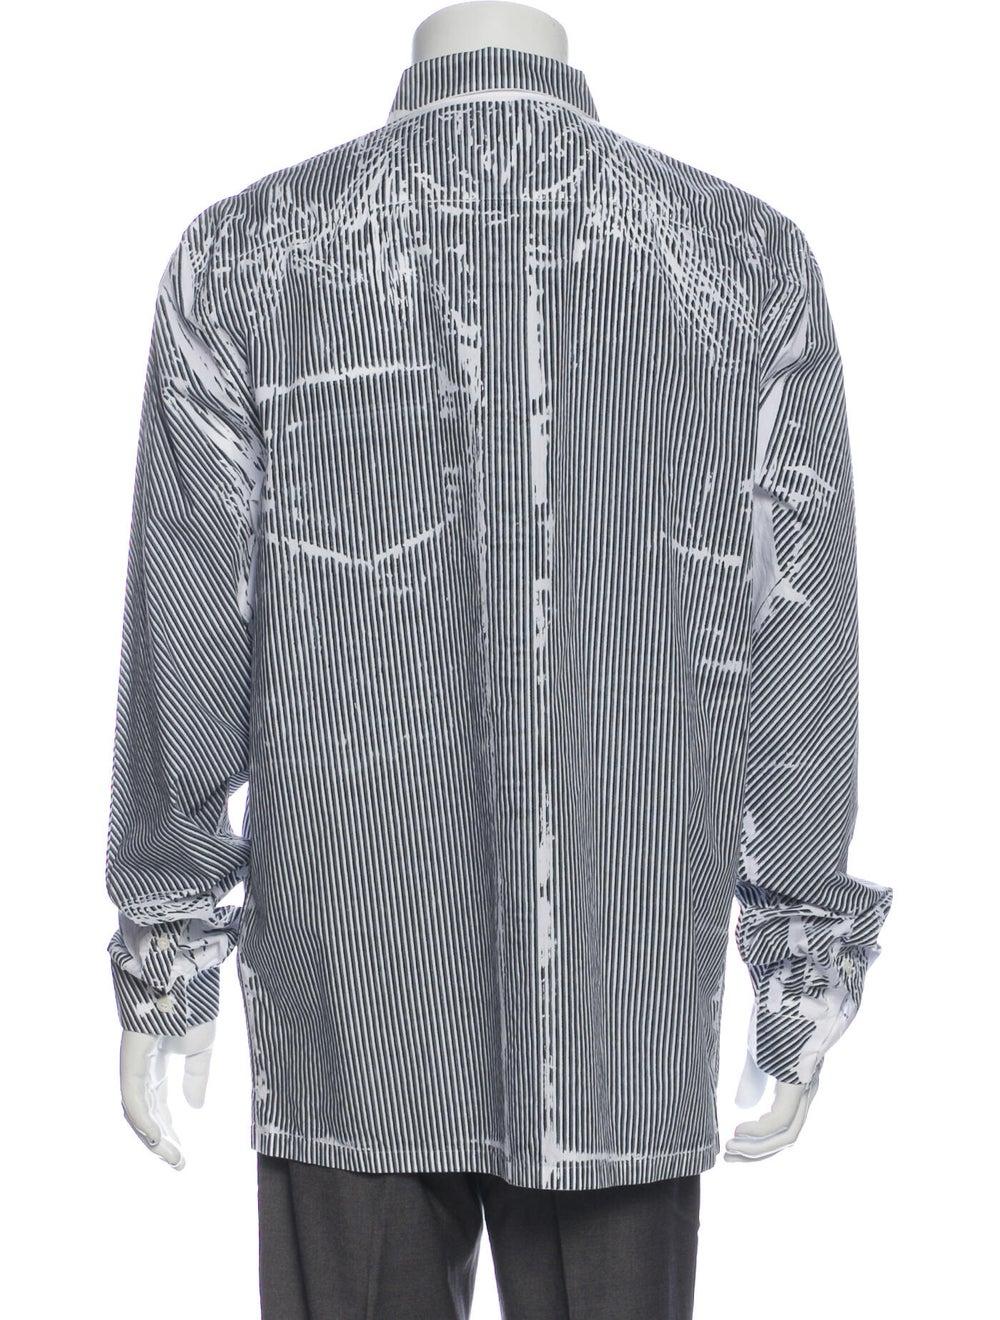 Prada 2019 Striped Dress Shirt Black - image 3